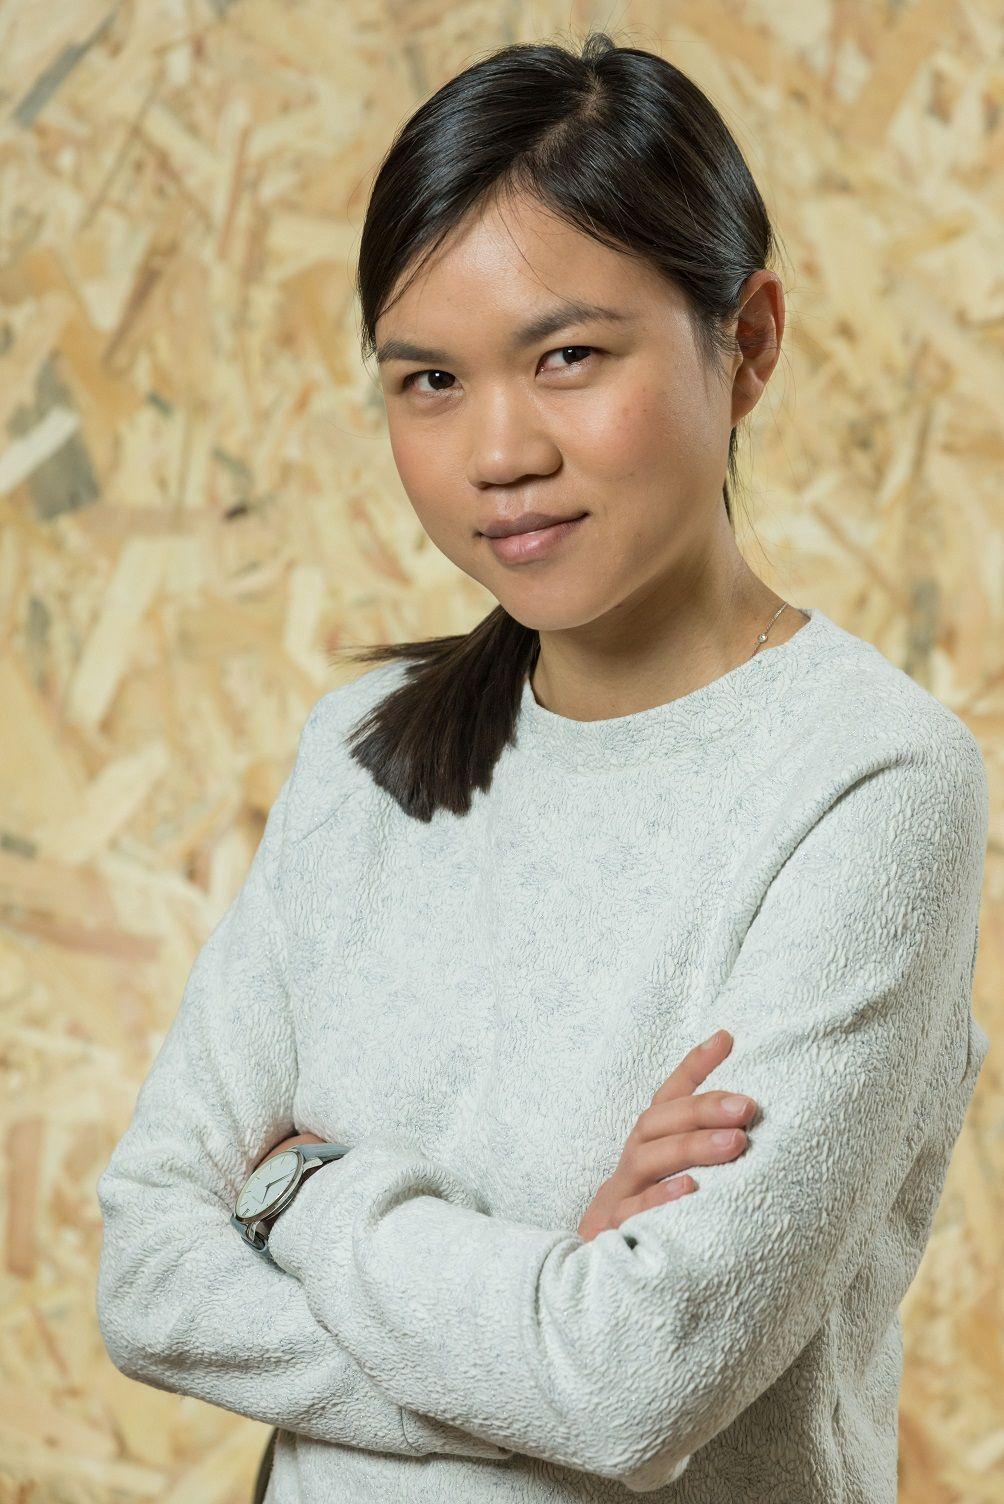 Ontruck nombra a Rika Christanto nueva directora de Operaciones